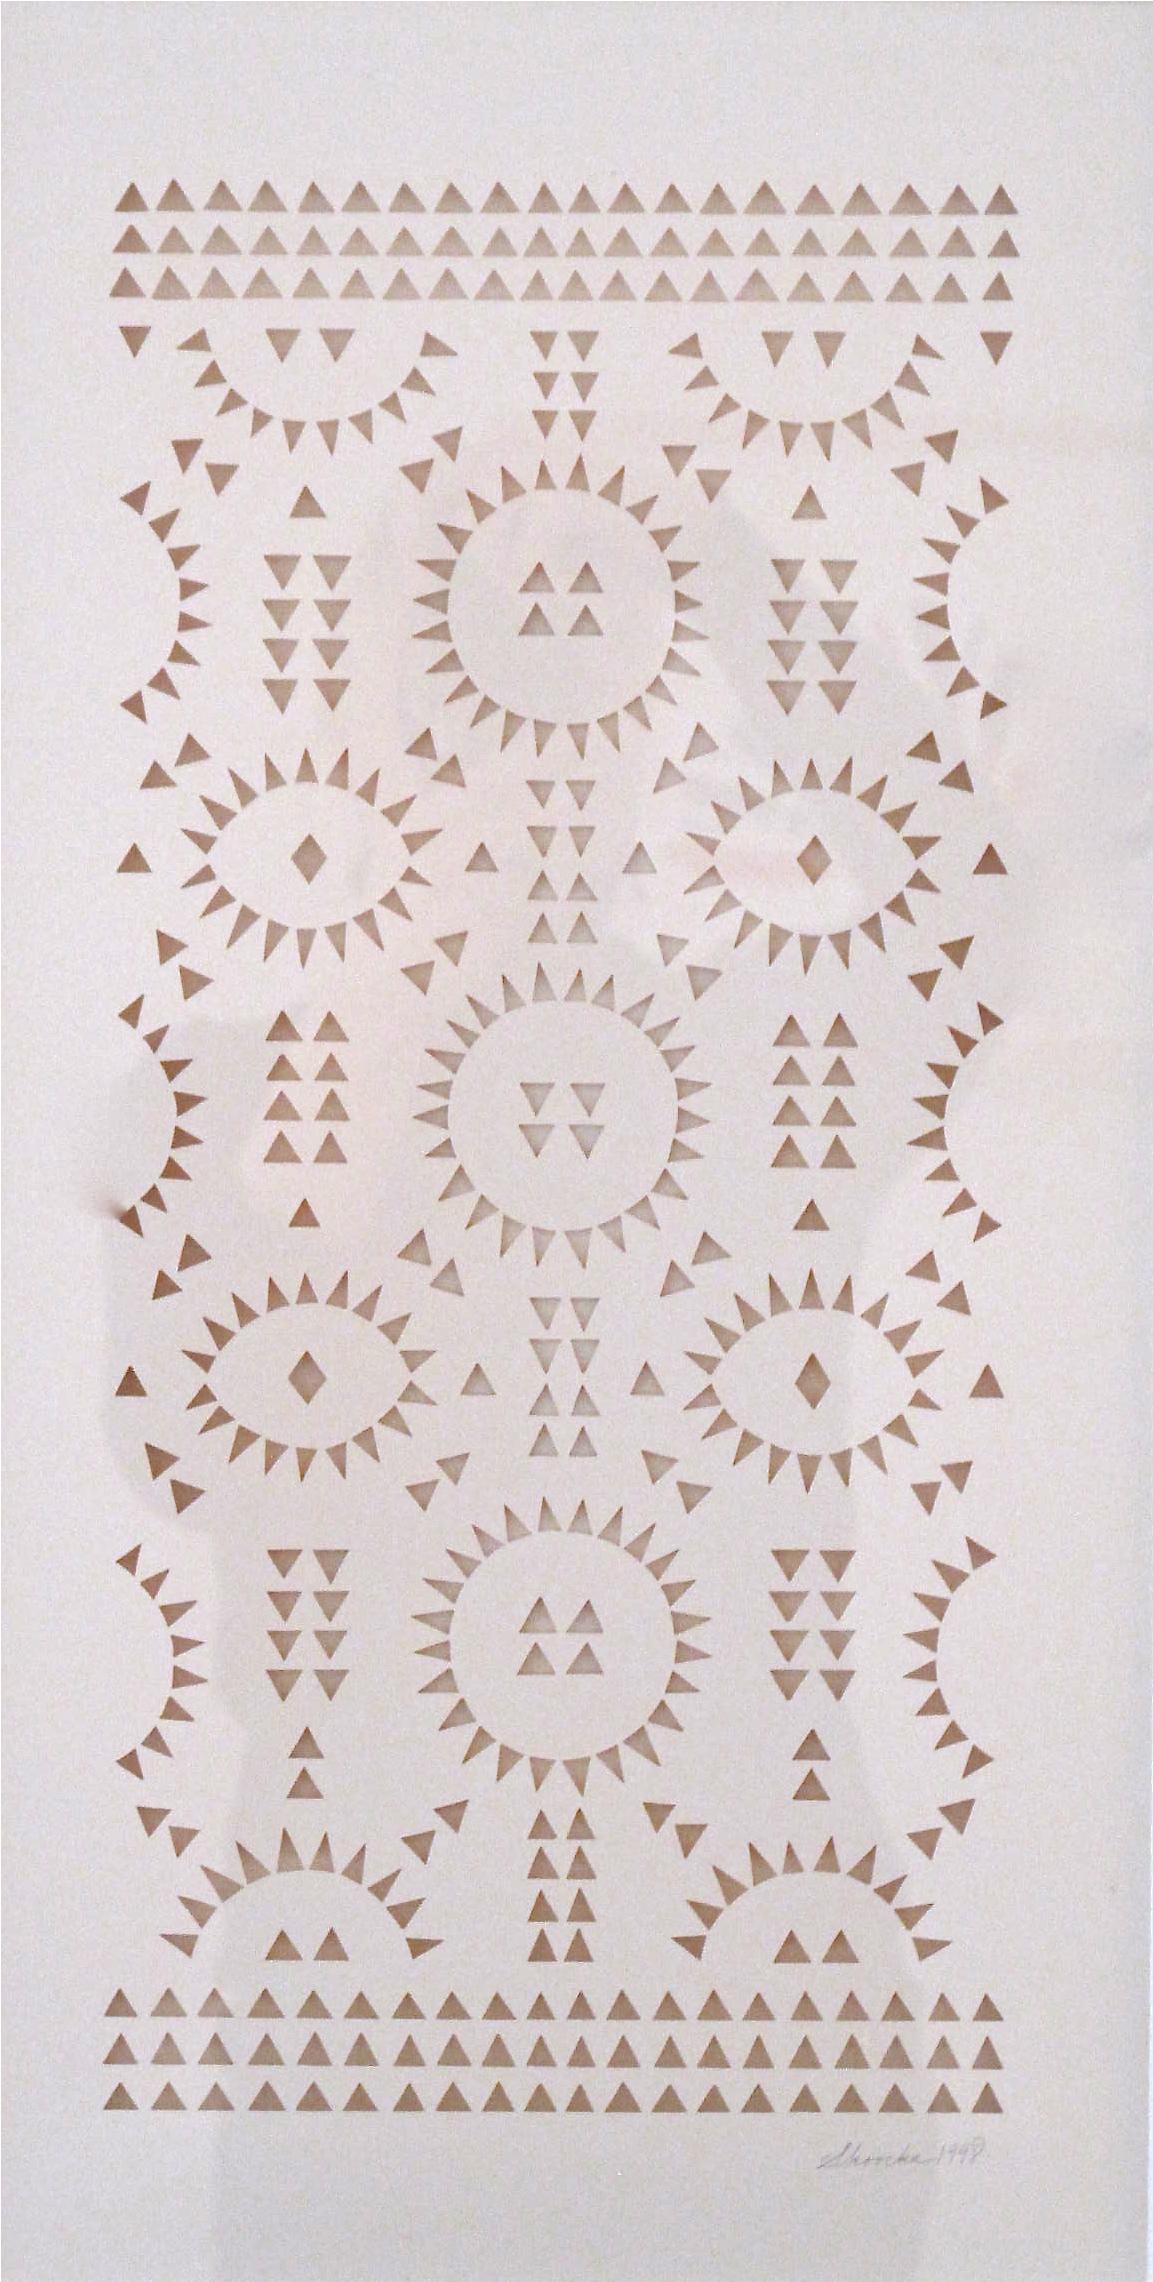 Susan Skoorka, Triangle 2